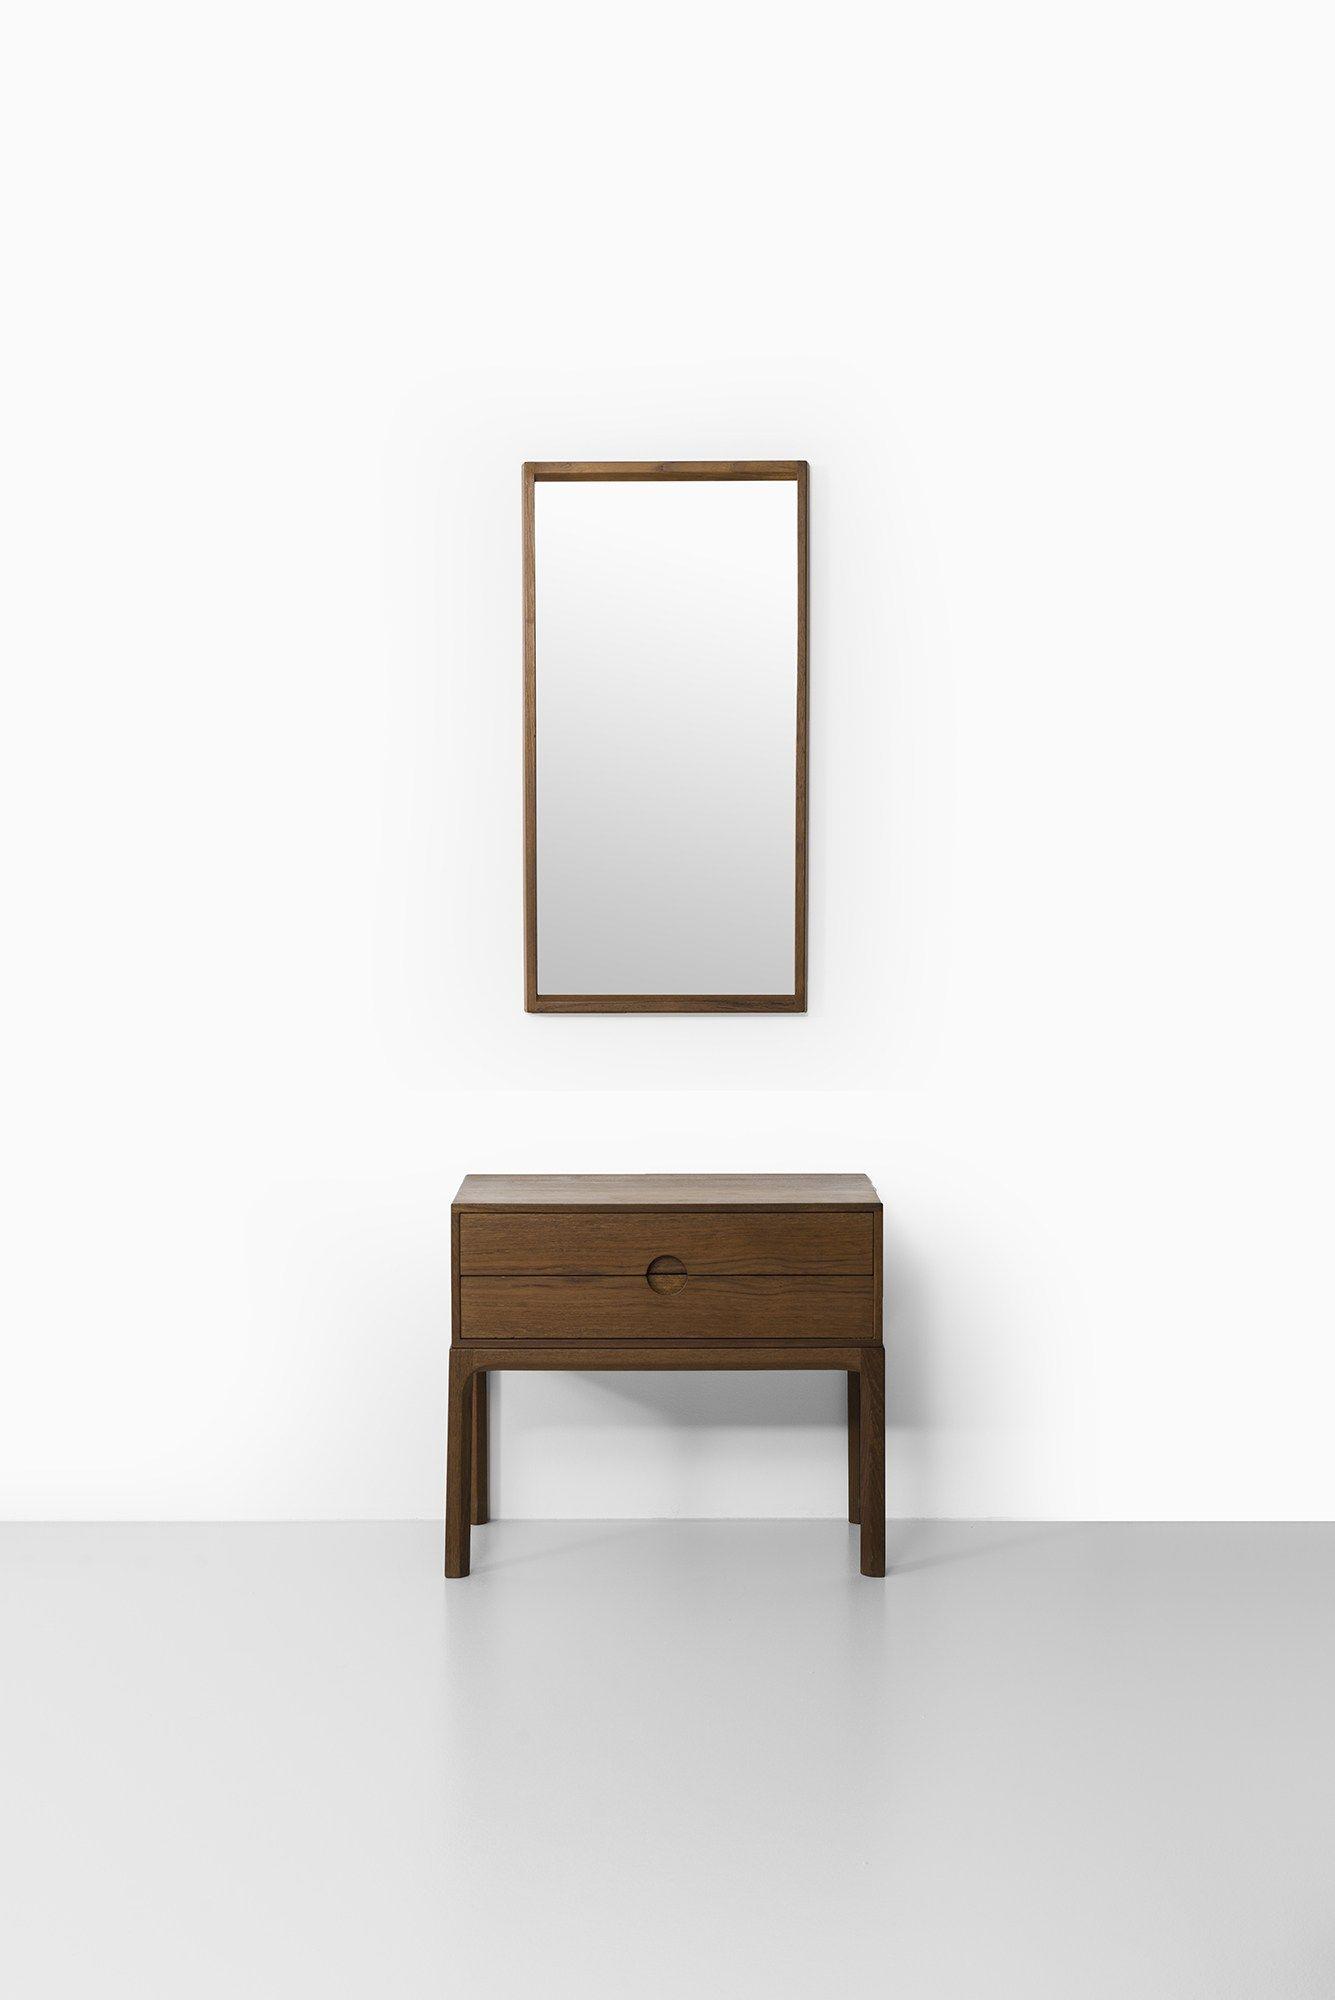 Aksel Kjersgaard bureau and mirror in teak at Studio Schalling